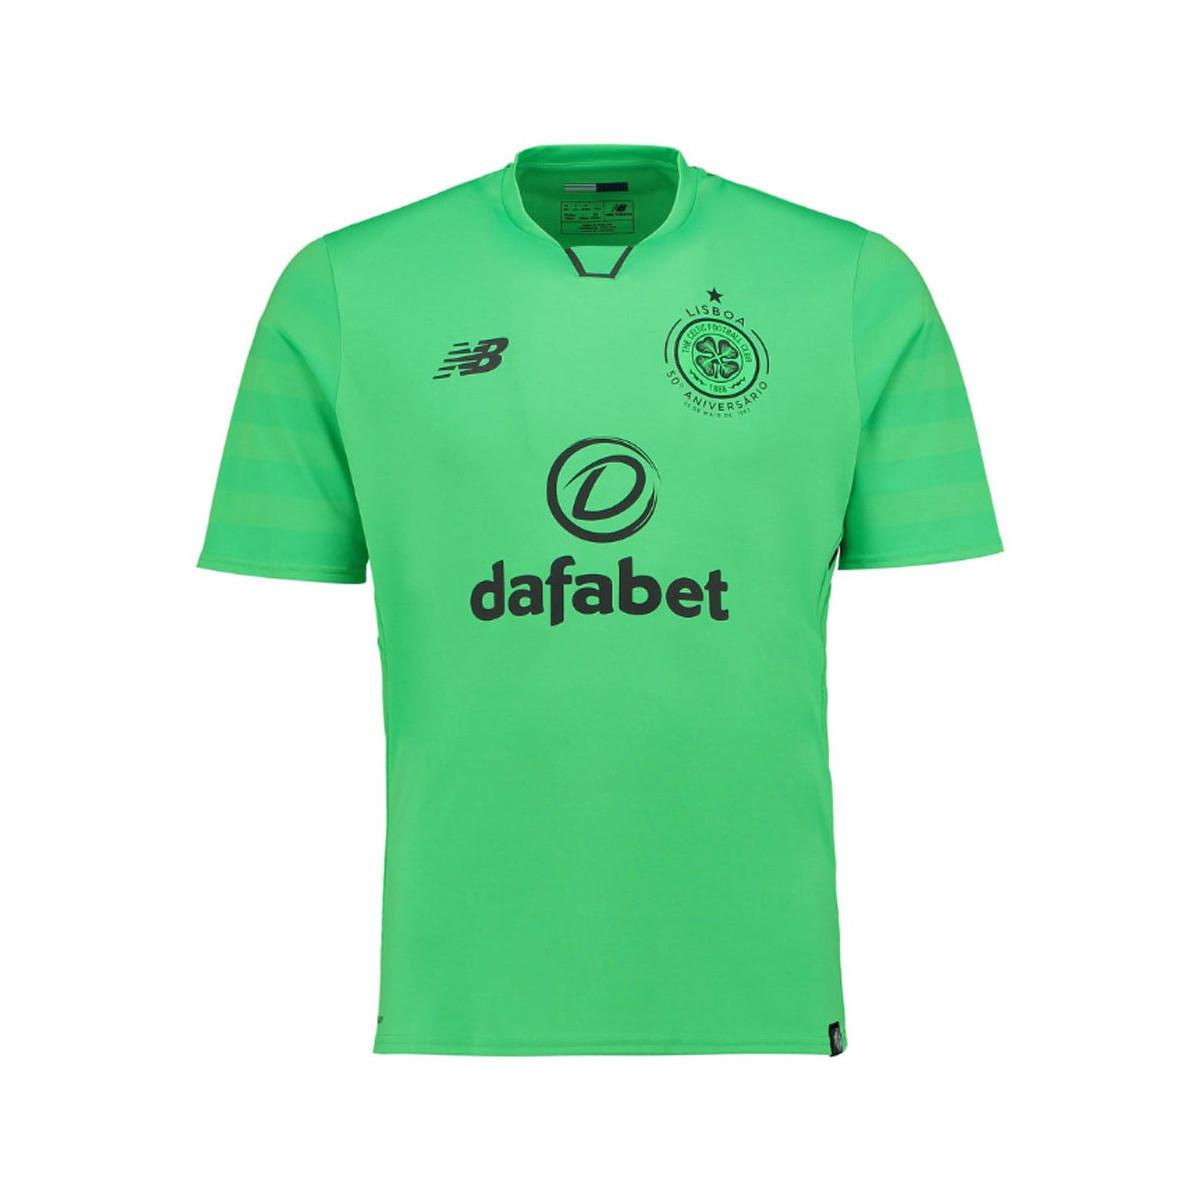 New Balance 2017-2018 Celtic Third Football Shirt Men s T Shirt In ... 9b29c6afa